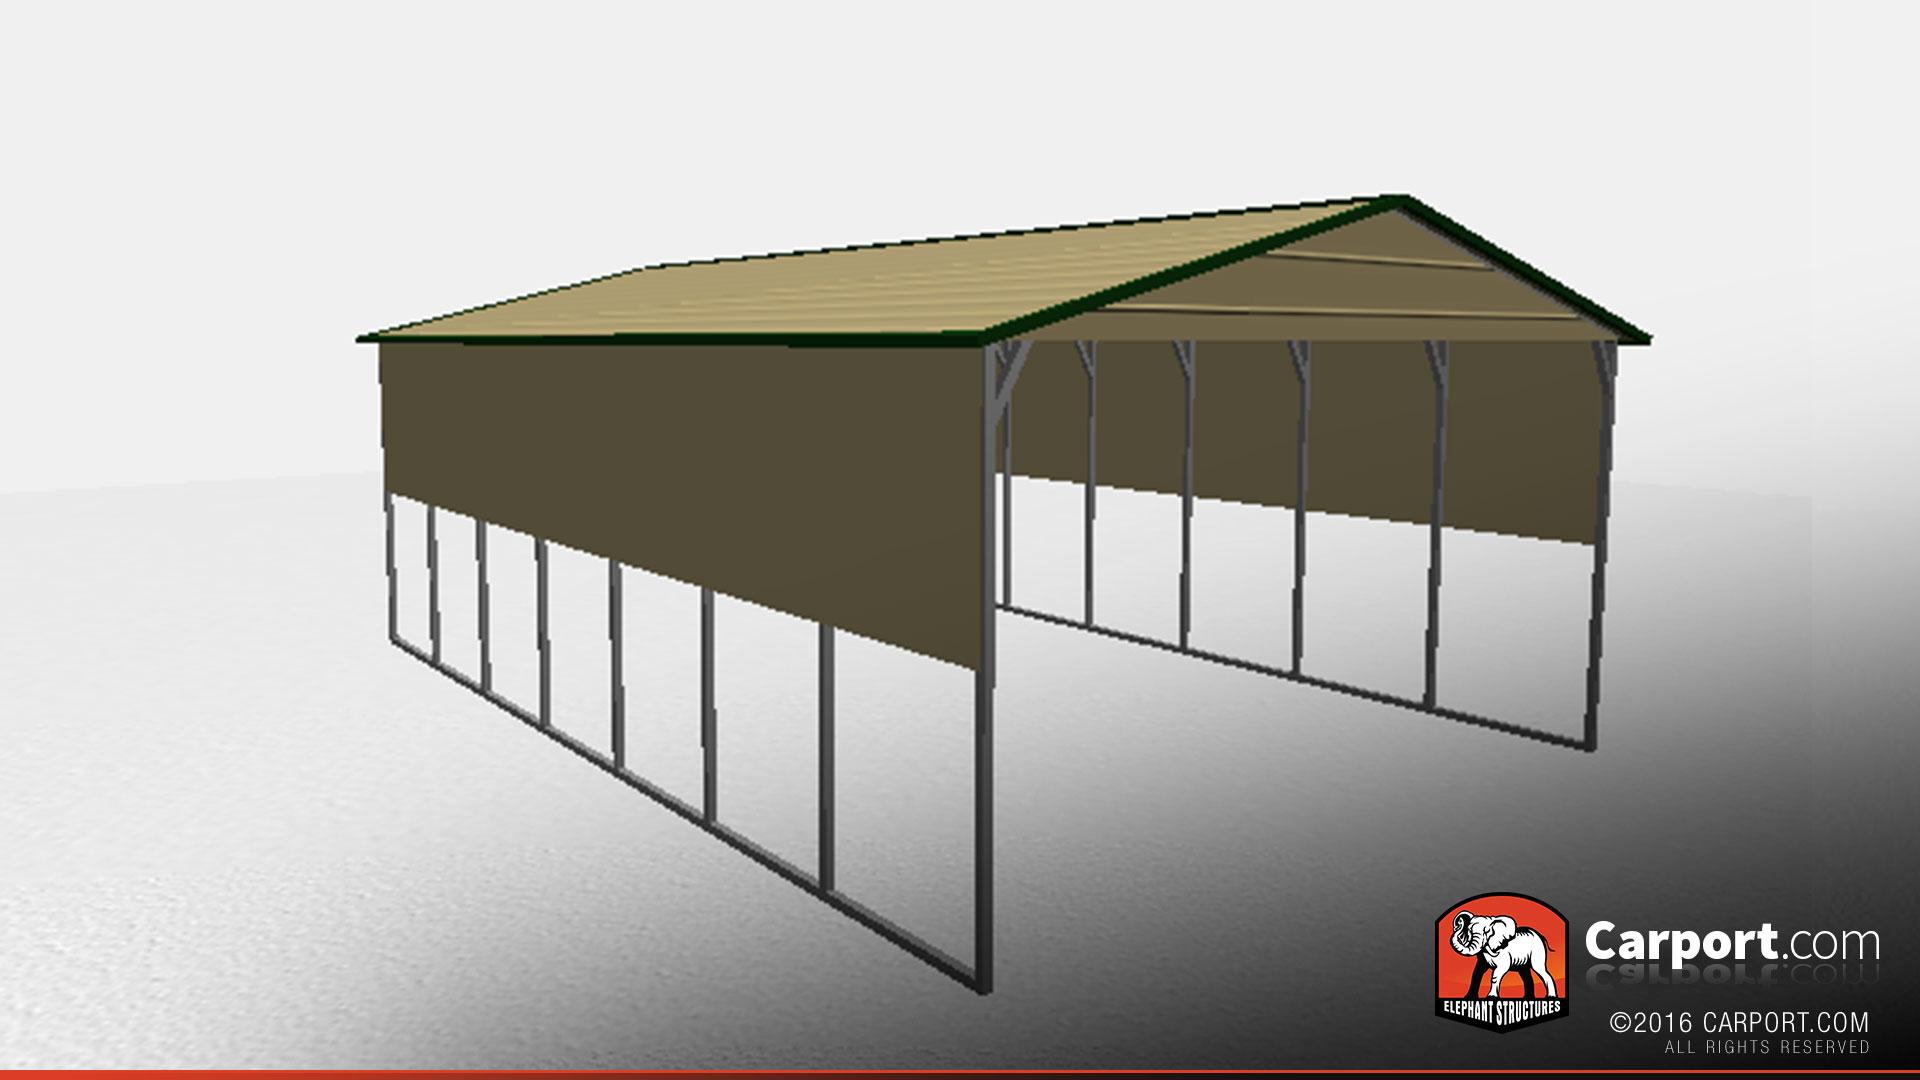 20 39 x 30 39 x 10 39 boxed eave metal carport metal carports info for 20x30 garage kit